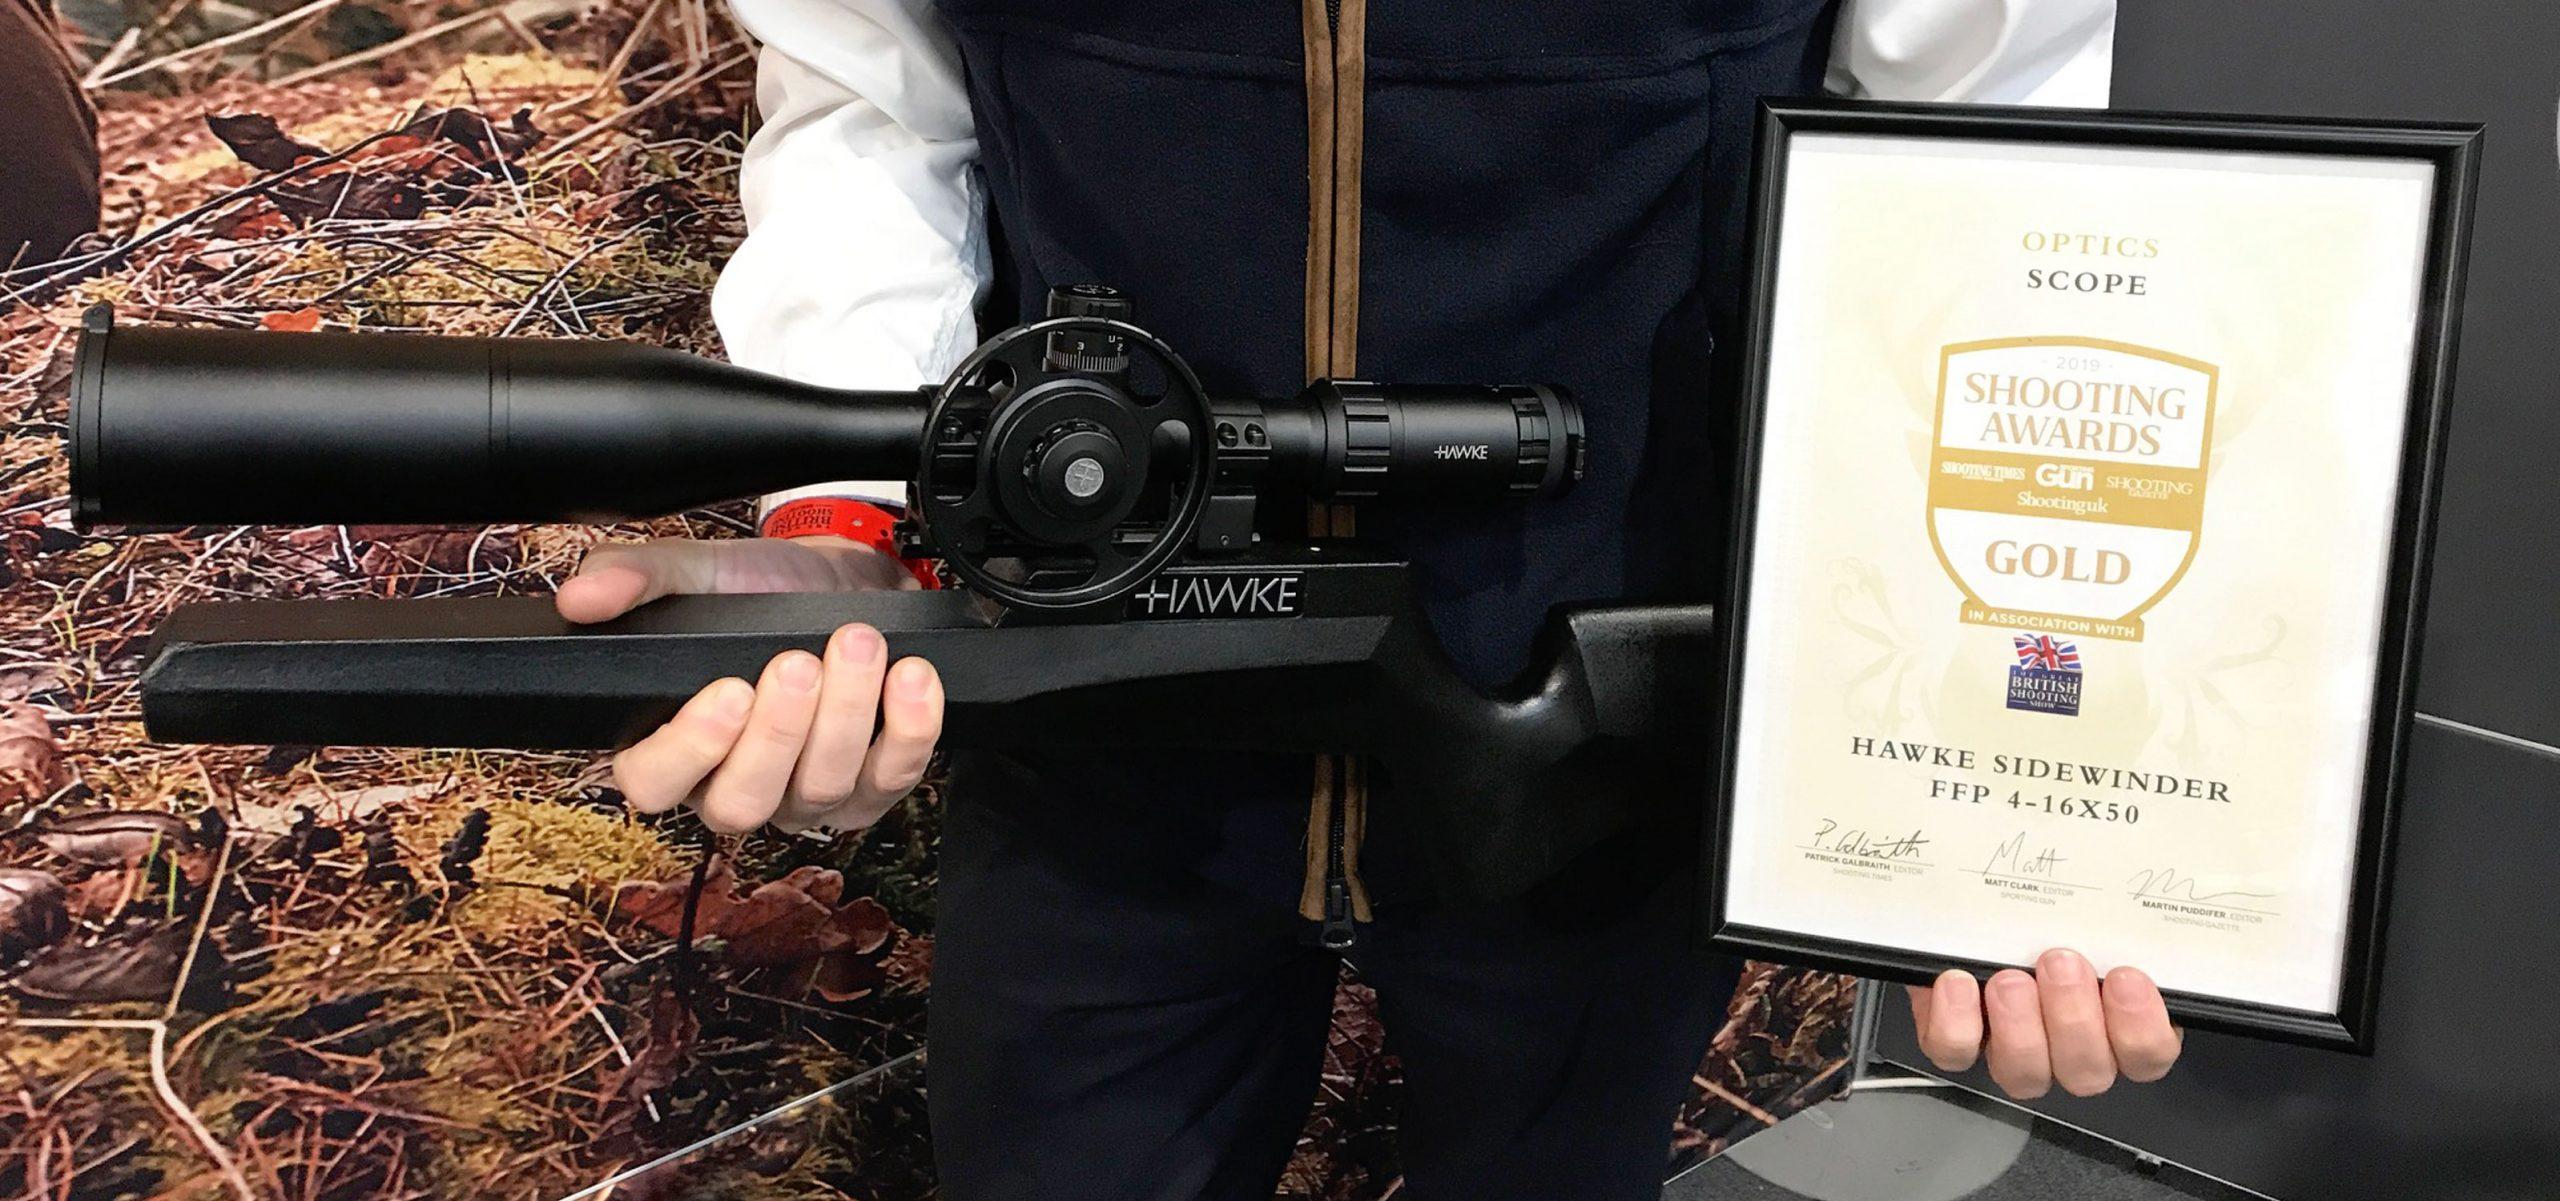 Shooting Award Winner – Gold